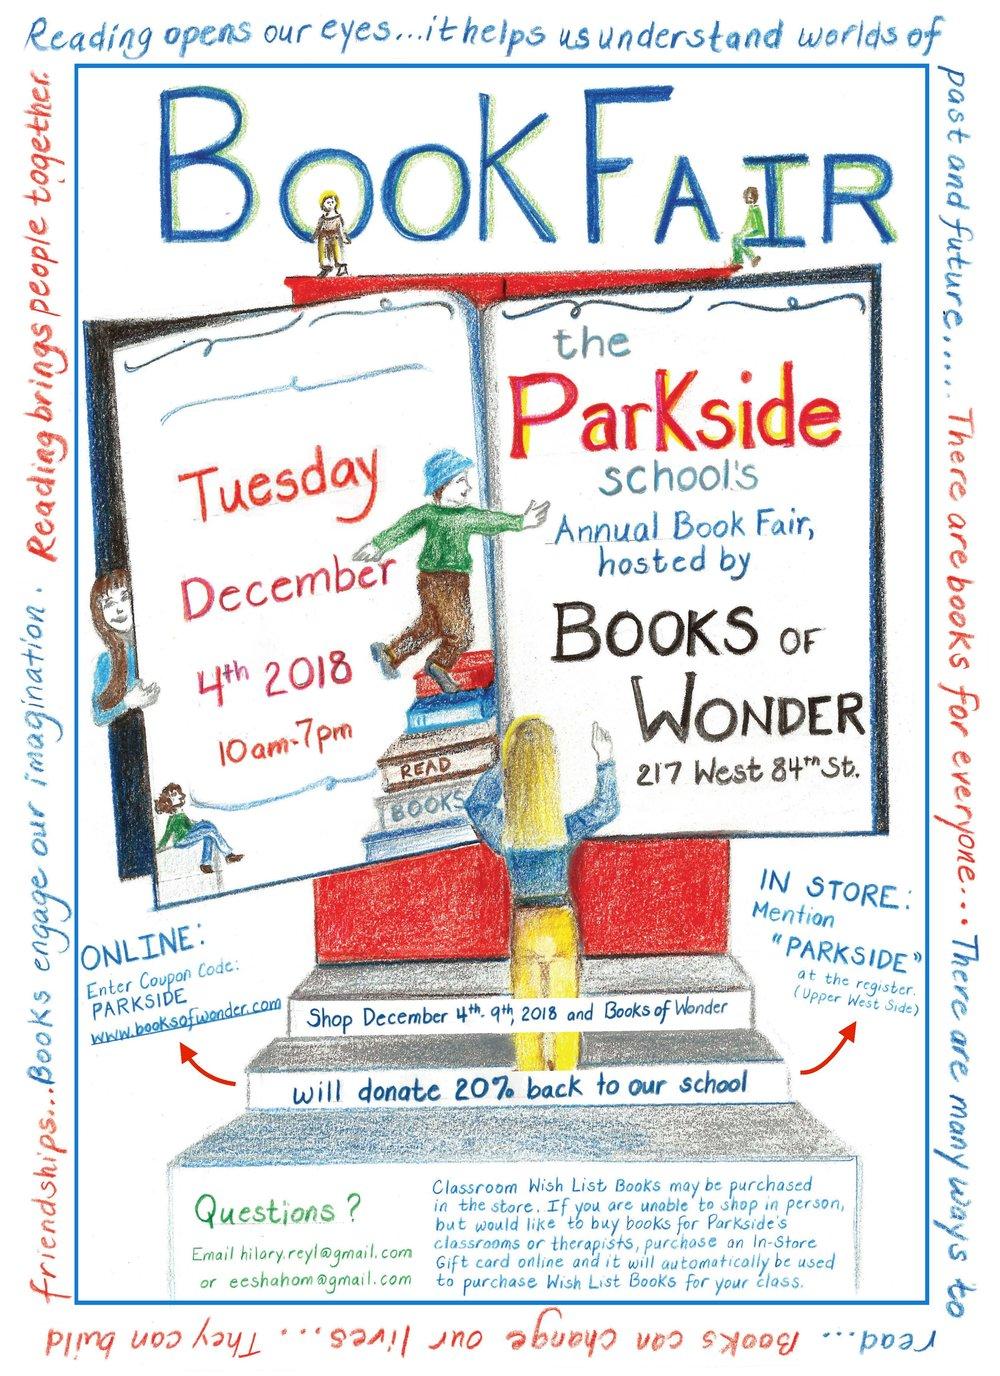 Book Fair Flyer Image.jpg